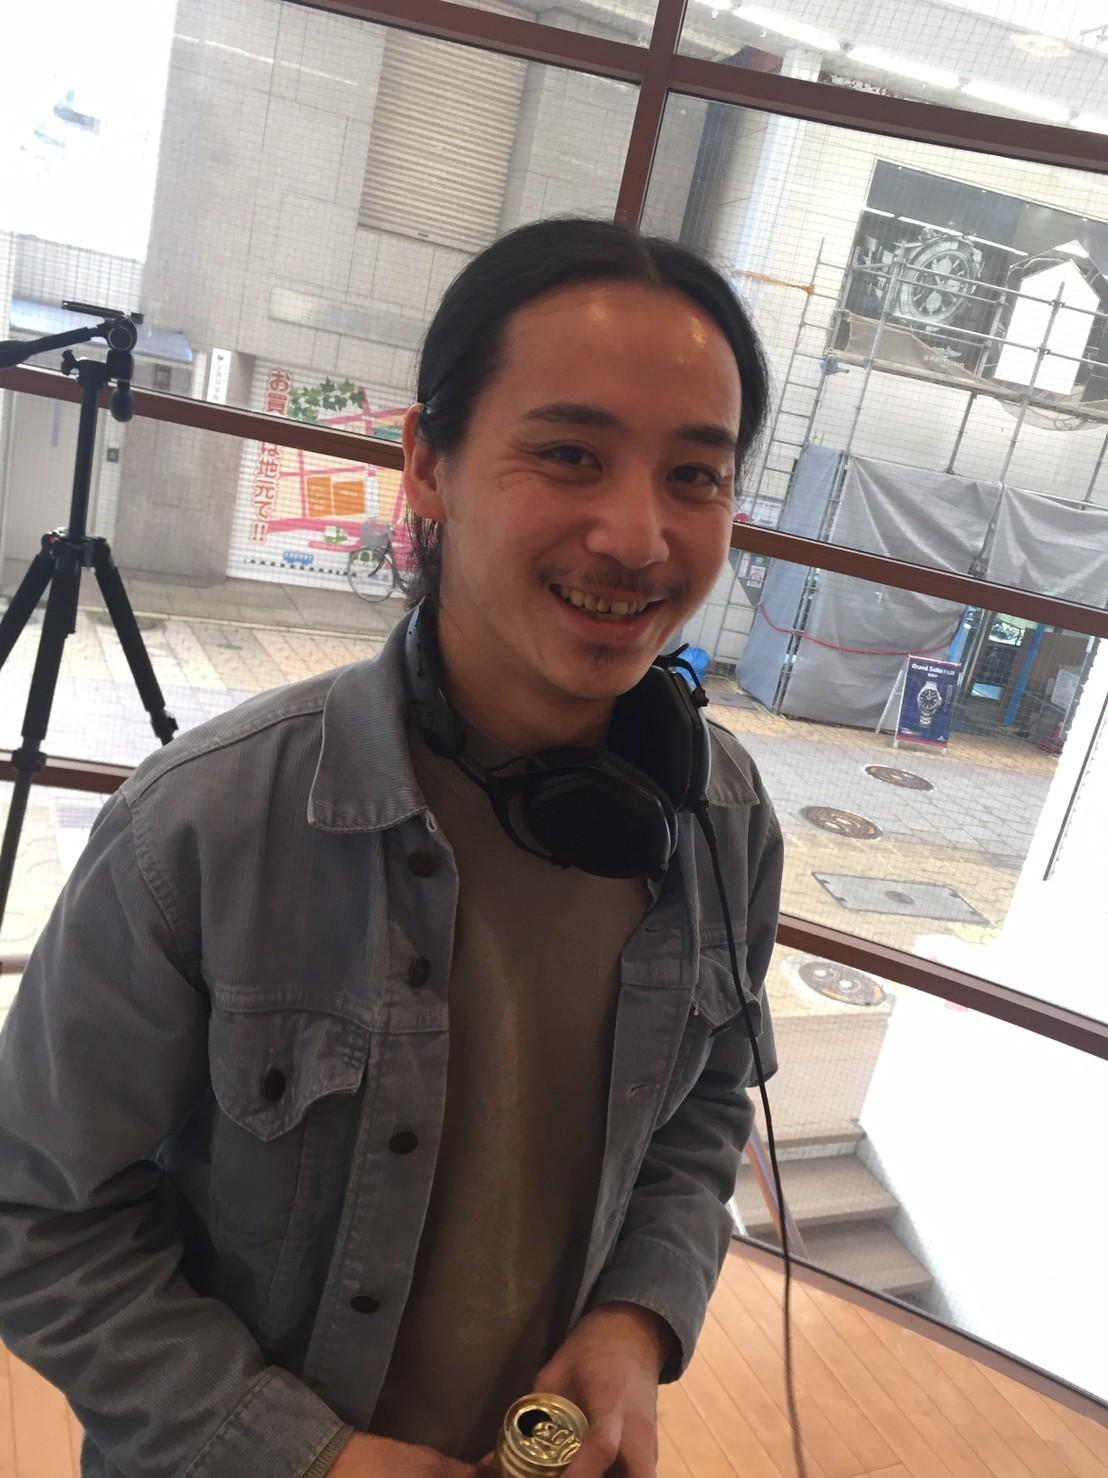 青木写真事務所設立記念展  TRIPPING OUT  レポ_e0115904_19020696.jpg